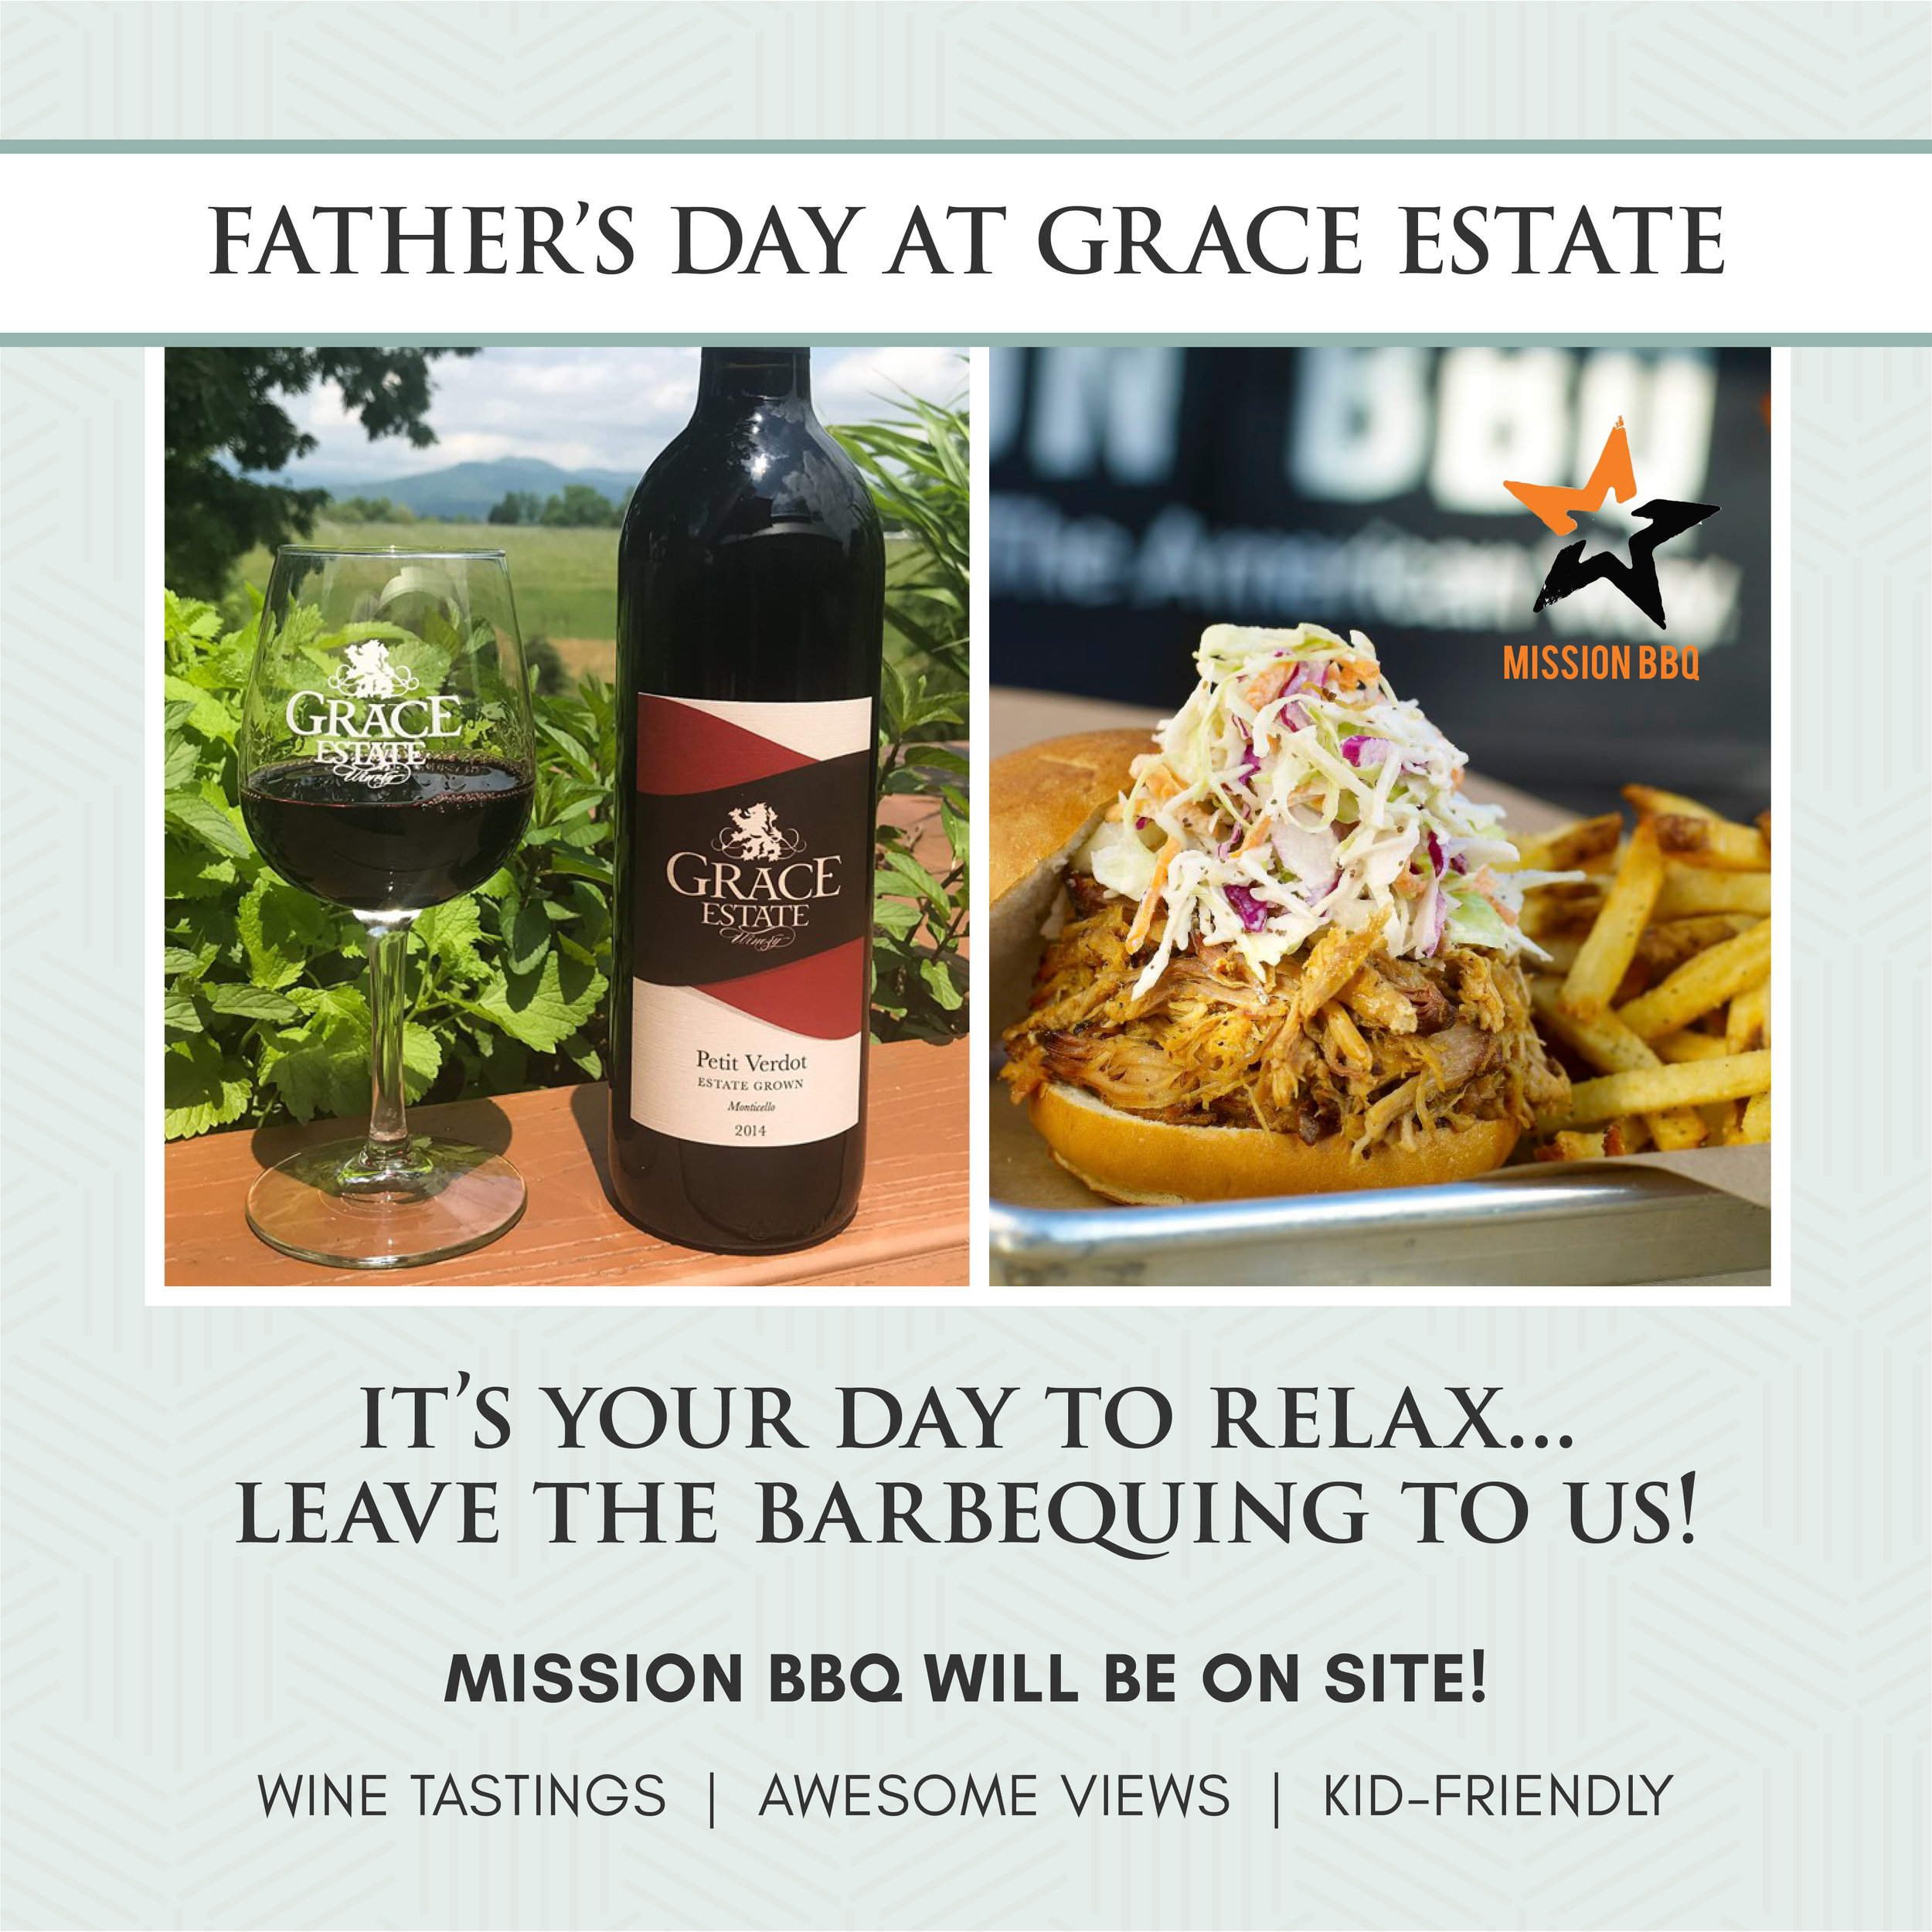 Grace Estate Fathers Day.jpg